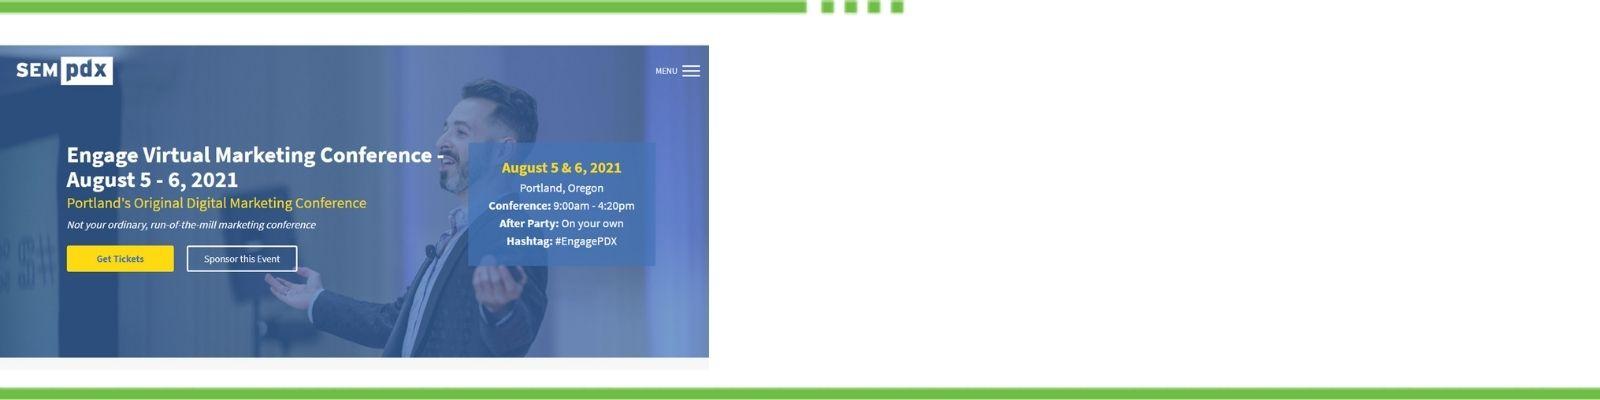 SEM PDX Engage Virtual Marketing Conference